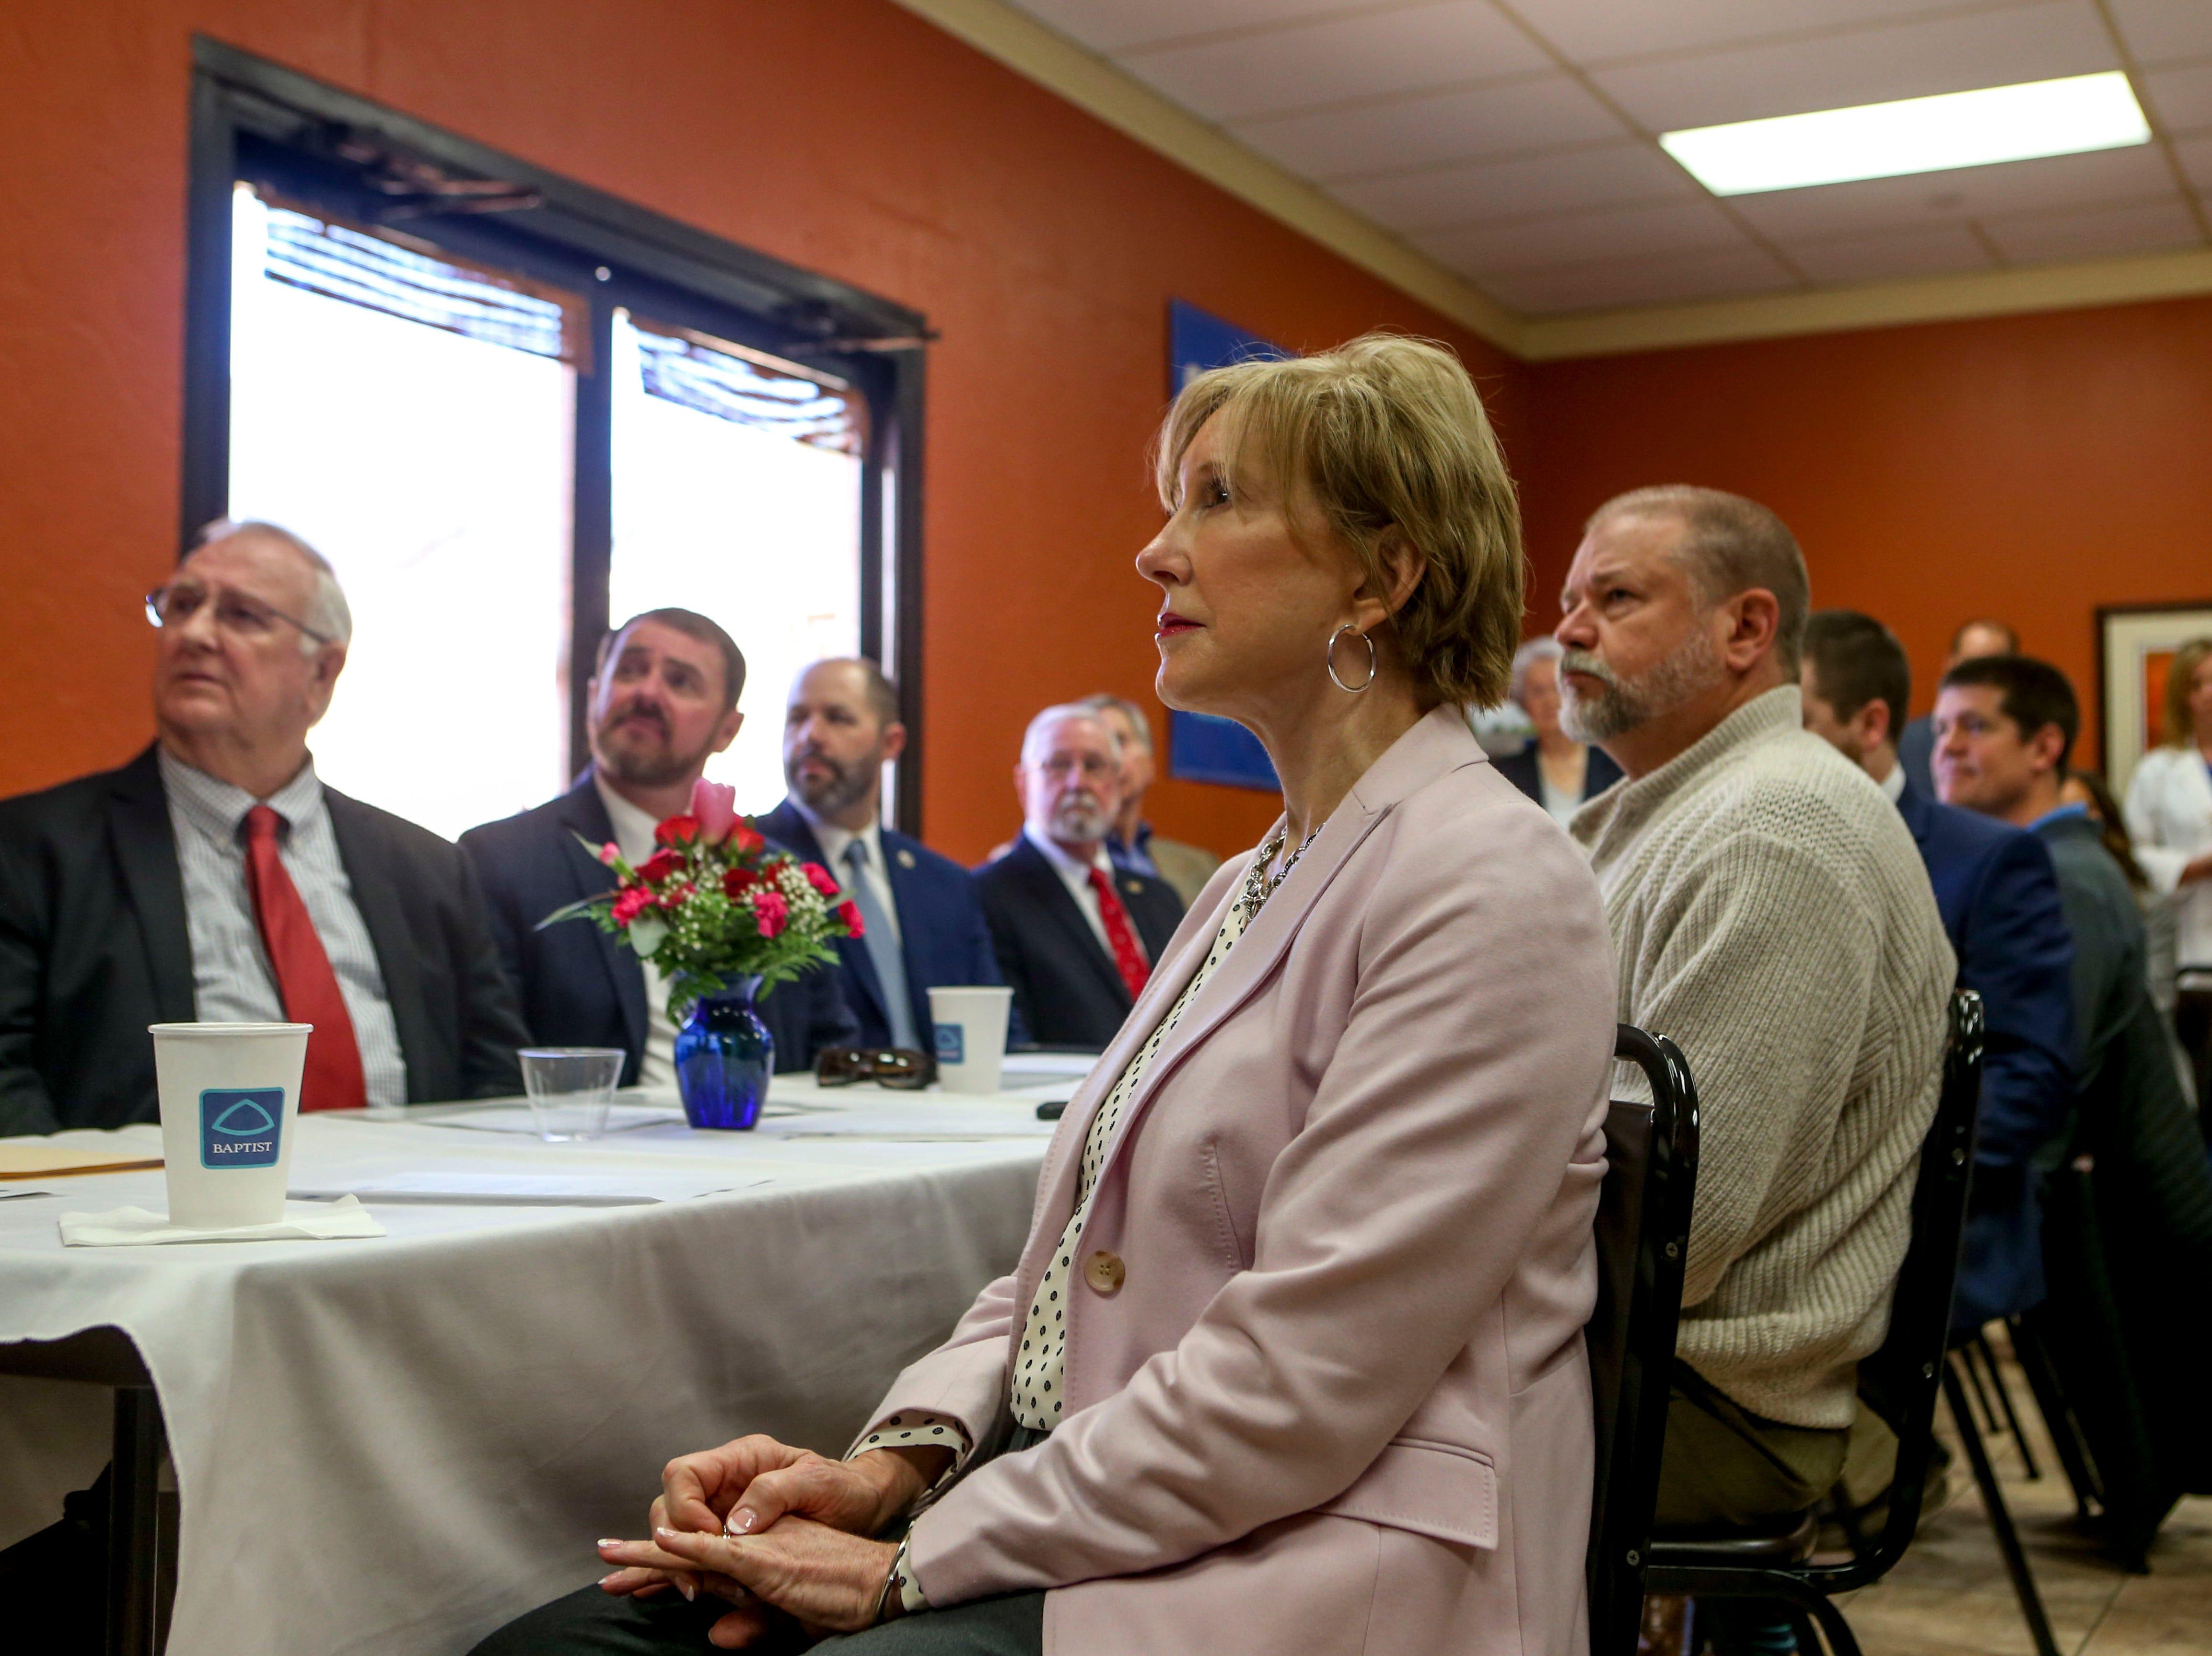 McKenzie mayor Jill Holland sits and listens to a presentation on telemedicine machines at Baptist Memorial Hospital in Huntingdon, Tenn., on Friday, Feb. 8, 2019.